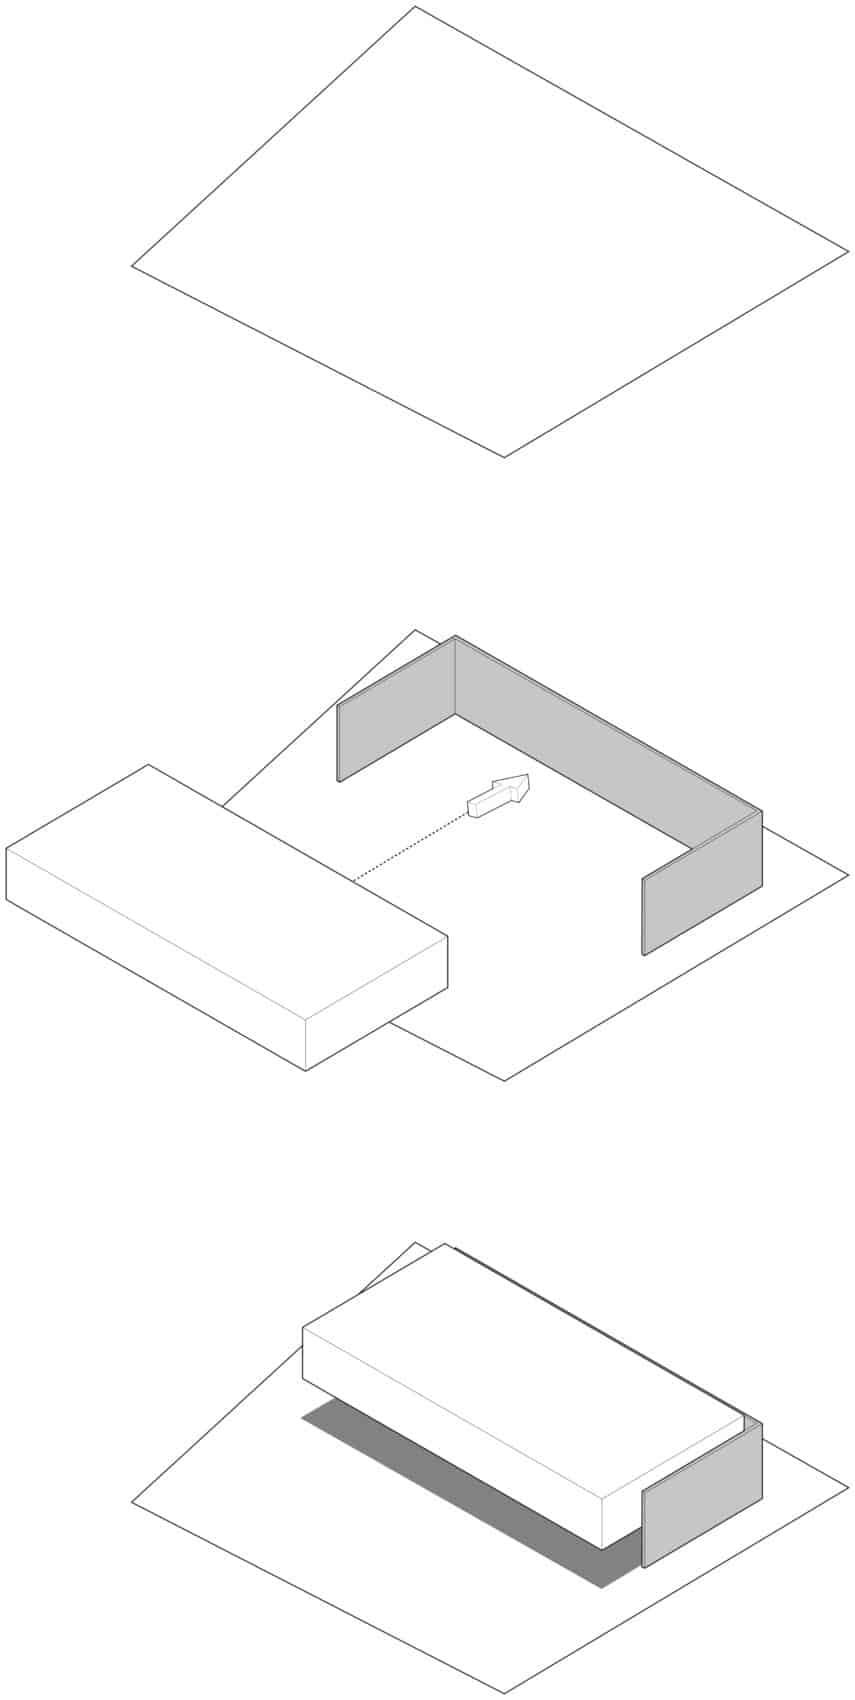 Ramp House by Studio mk27 (47)